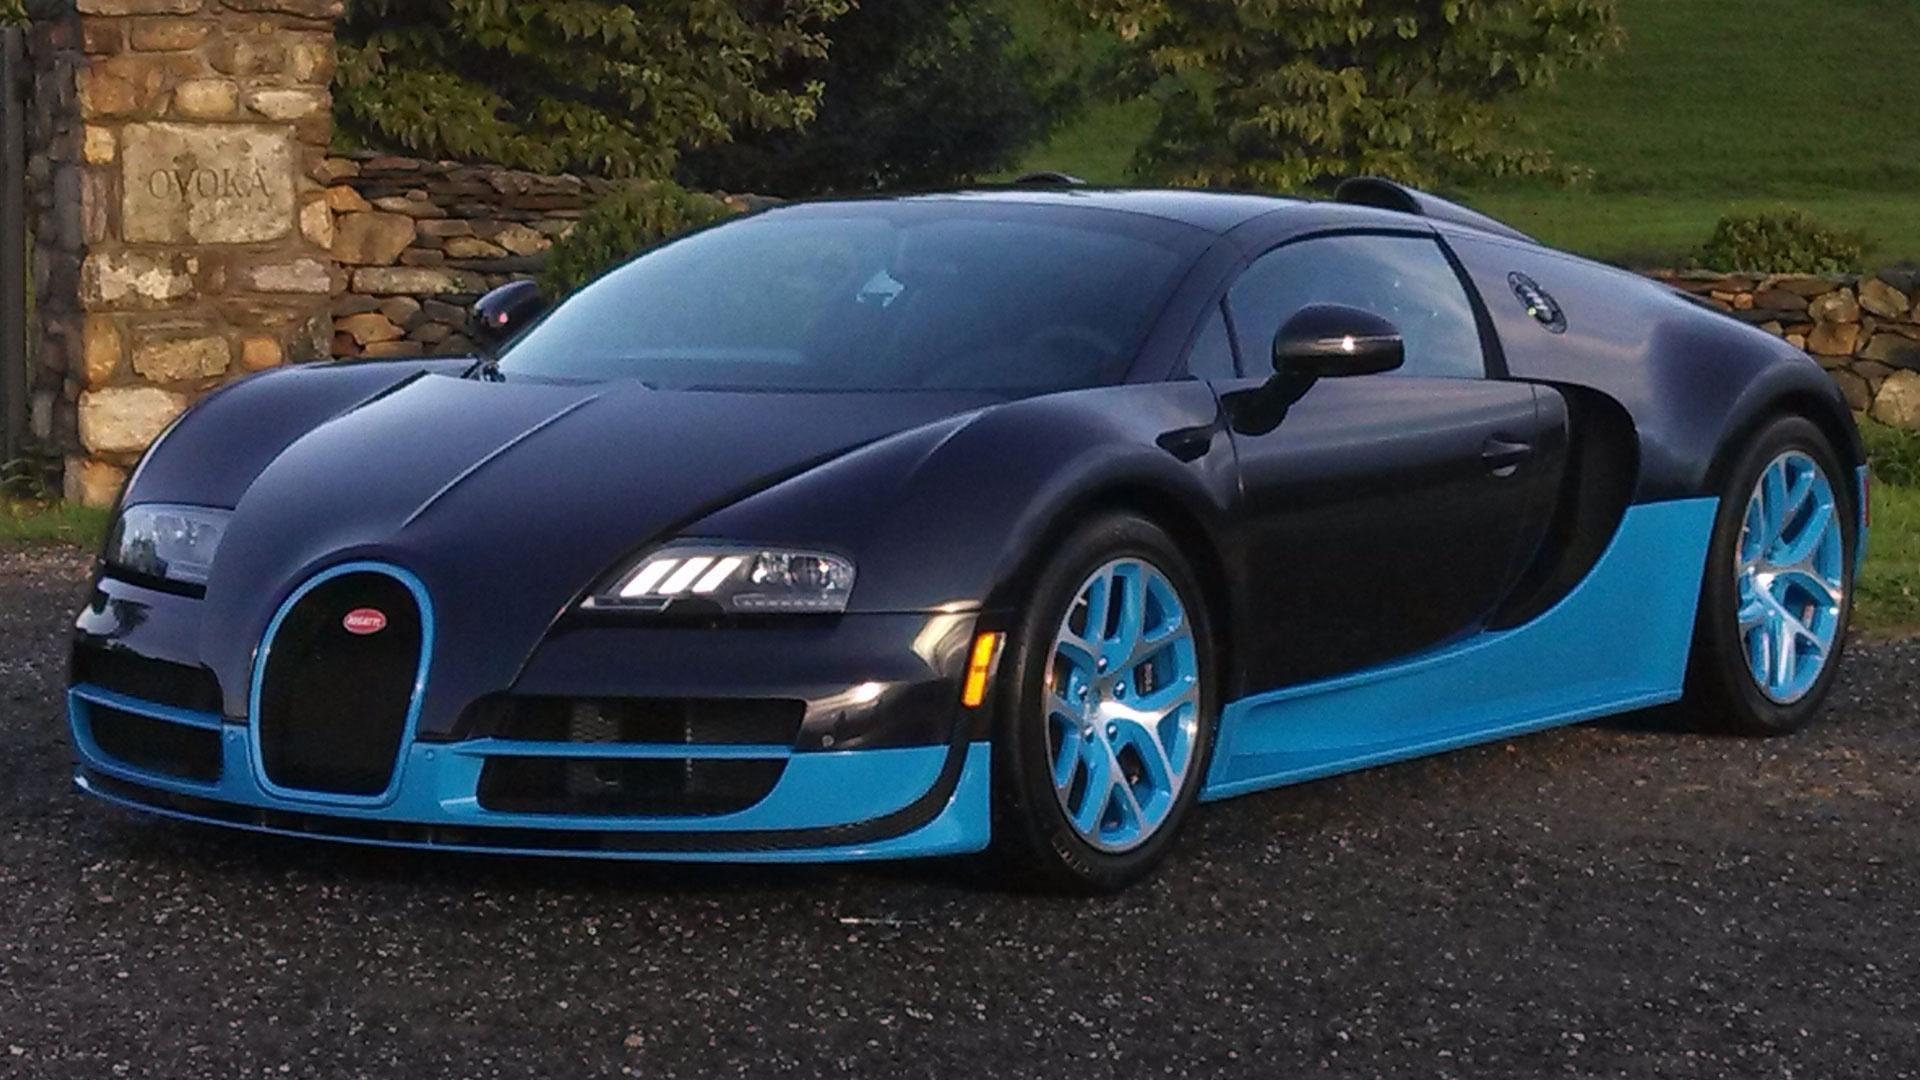 2013 Bugatti Veyron Grand Sport Vitesse & 2013 Mitsubishi Ou image